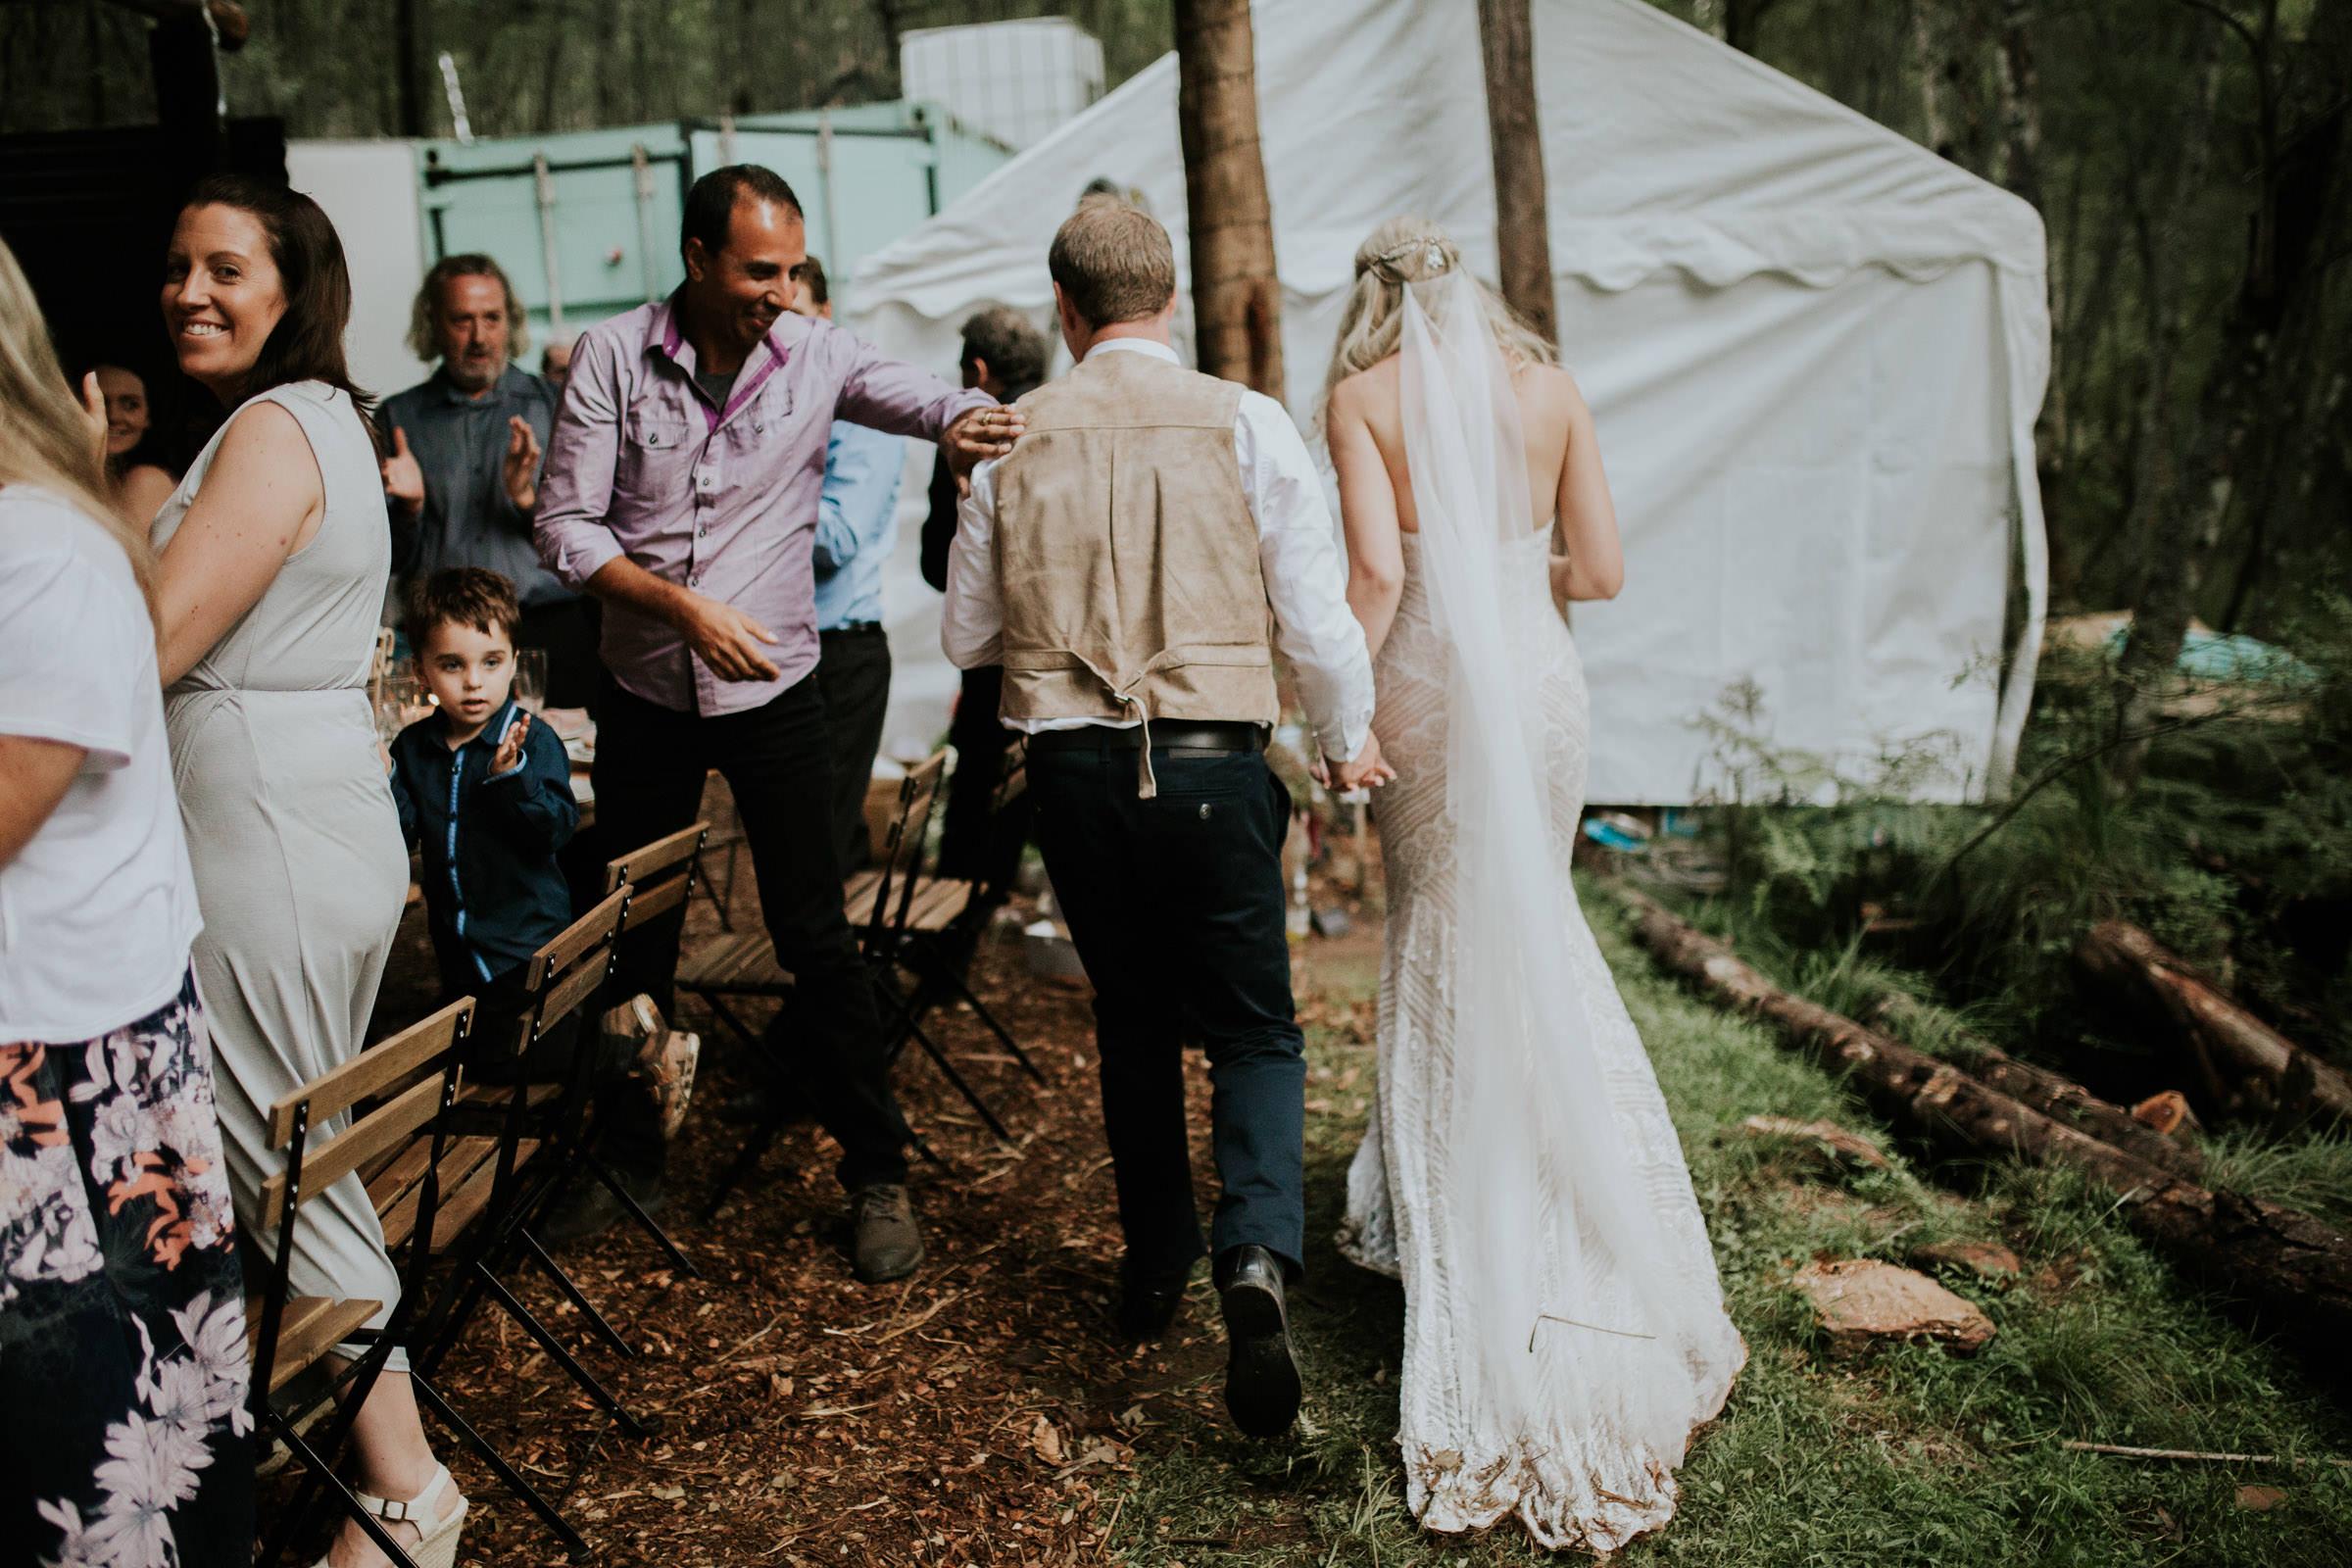 Emma+John+Far+South+Coast+Wedding+Festivl+Glamping+Bush-154.jpg